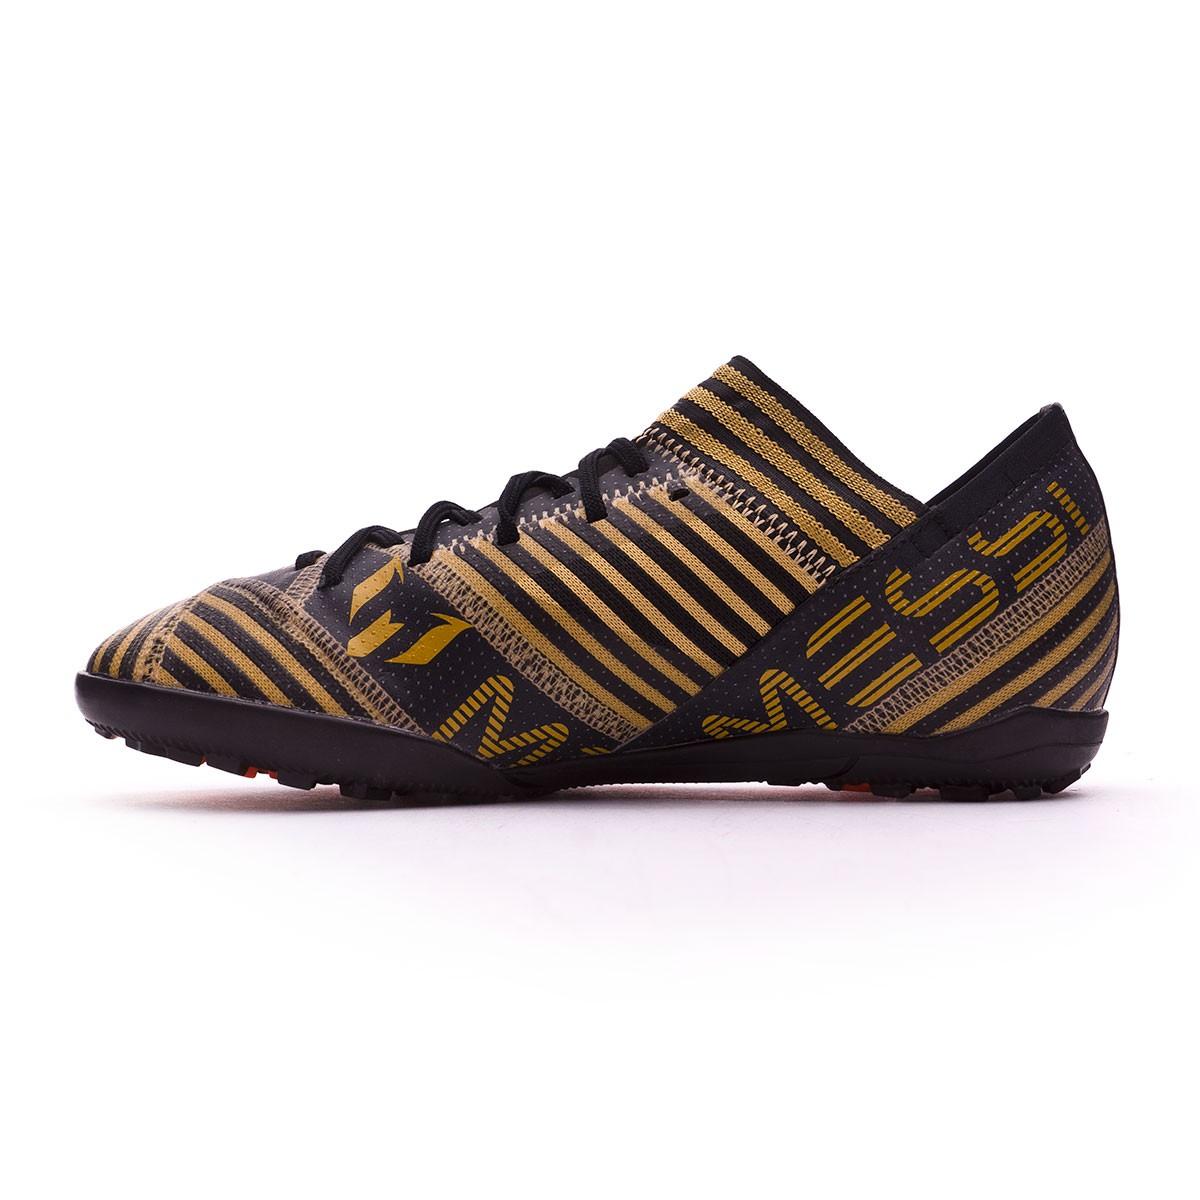 c0726c64ac059 Zapatilla adidas Nemeziz Messi Tango 17.3 Turf Niño Core black-Solar  red-Tactile gold metallic - Tienda de fútbol Fútbol Emotion